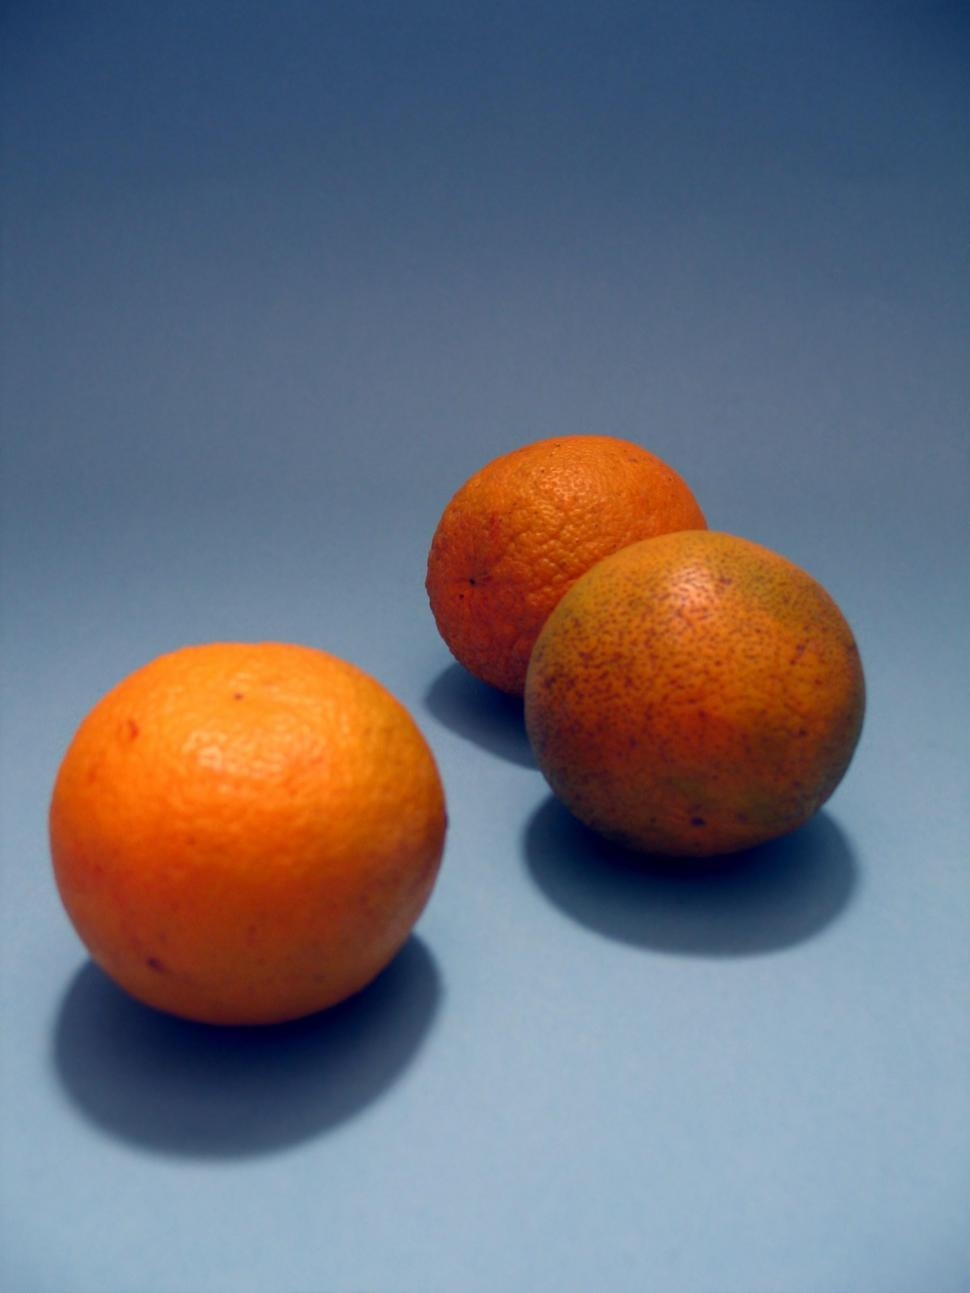 Download Free Stock Photo of Three Oranges